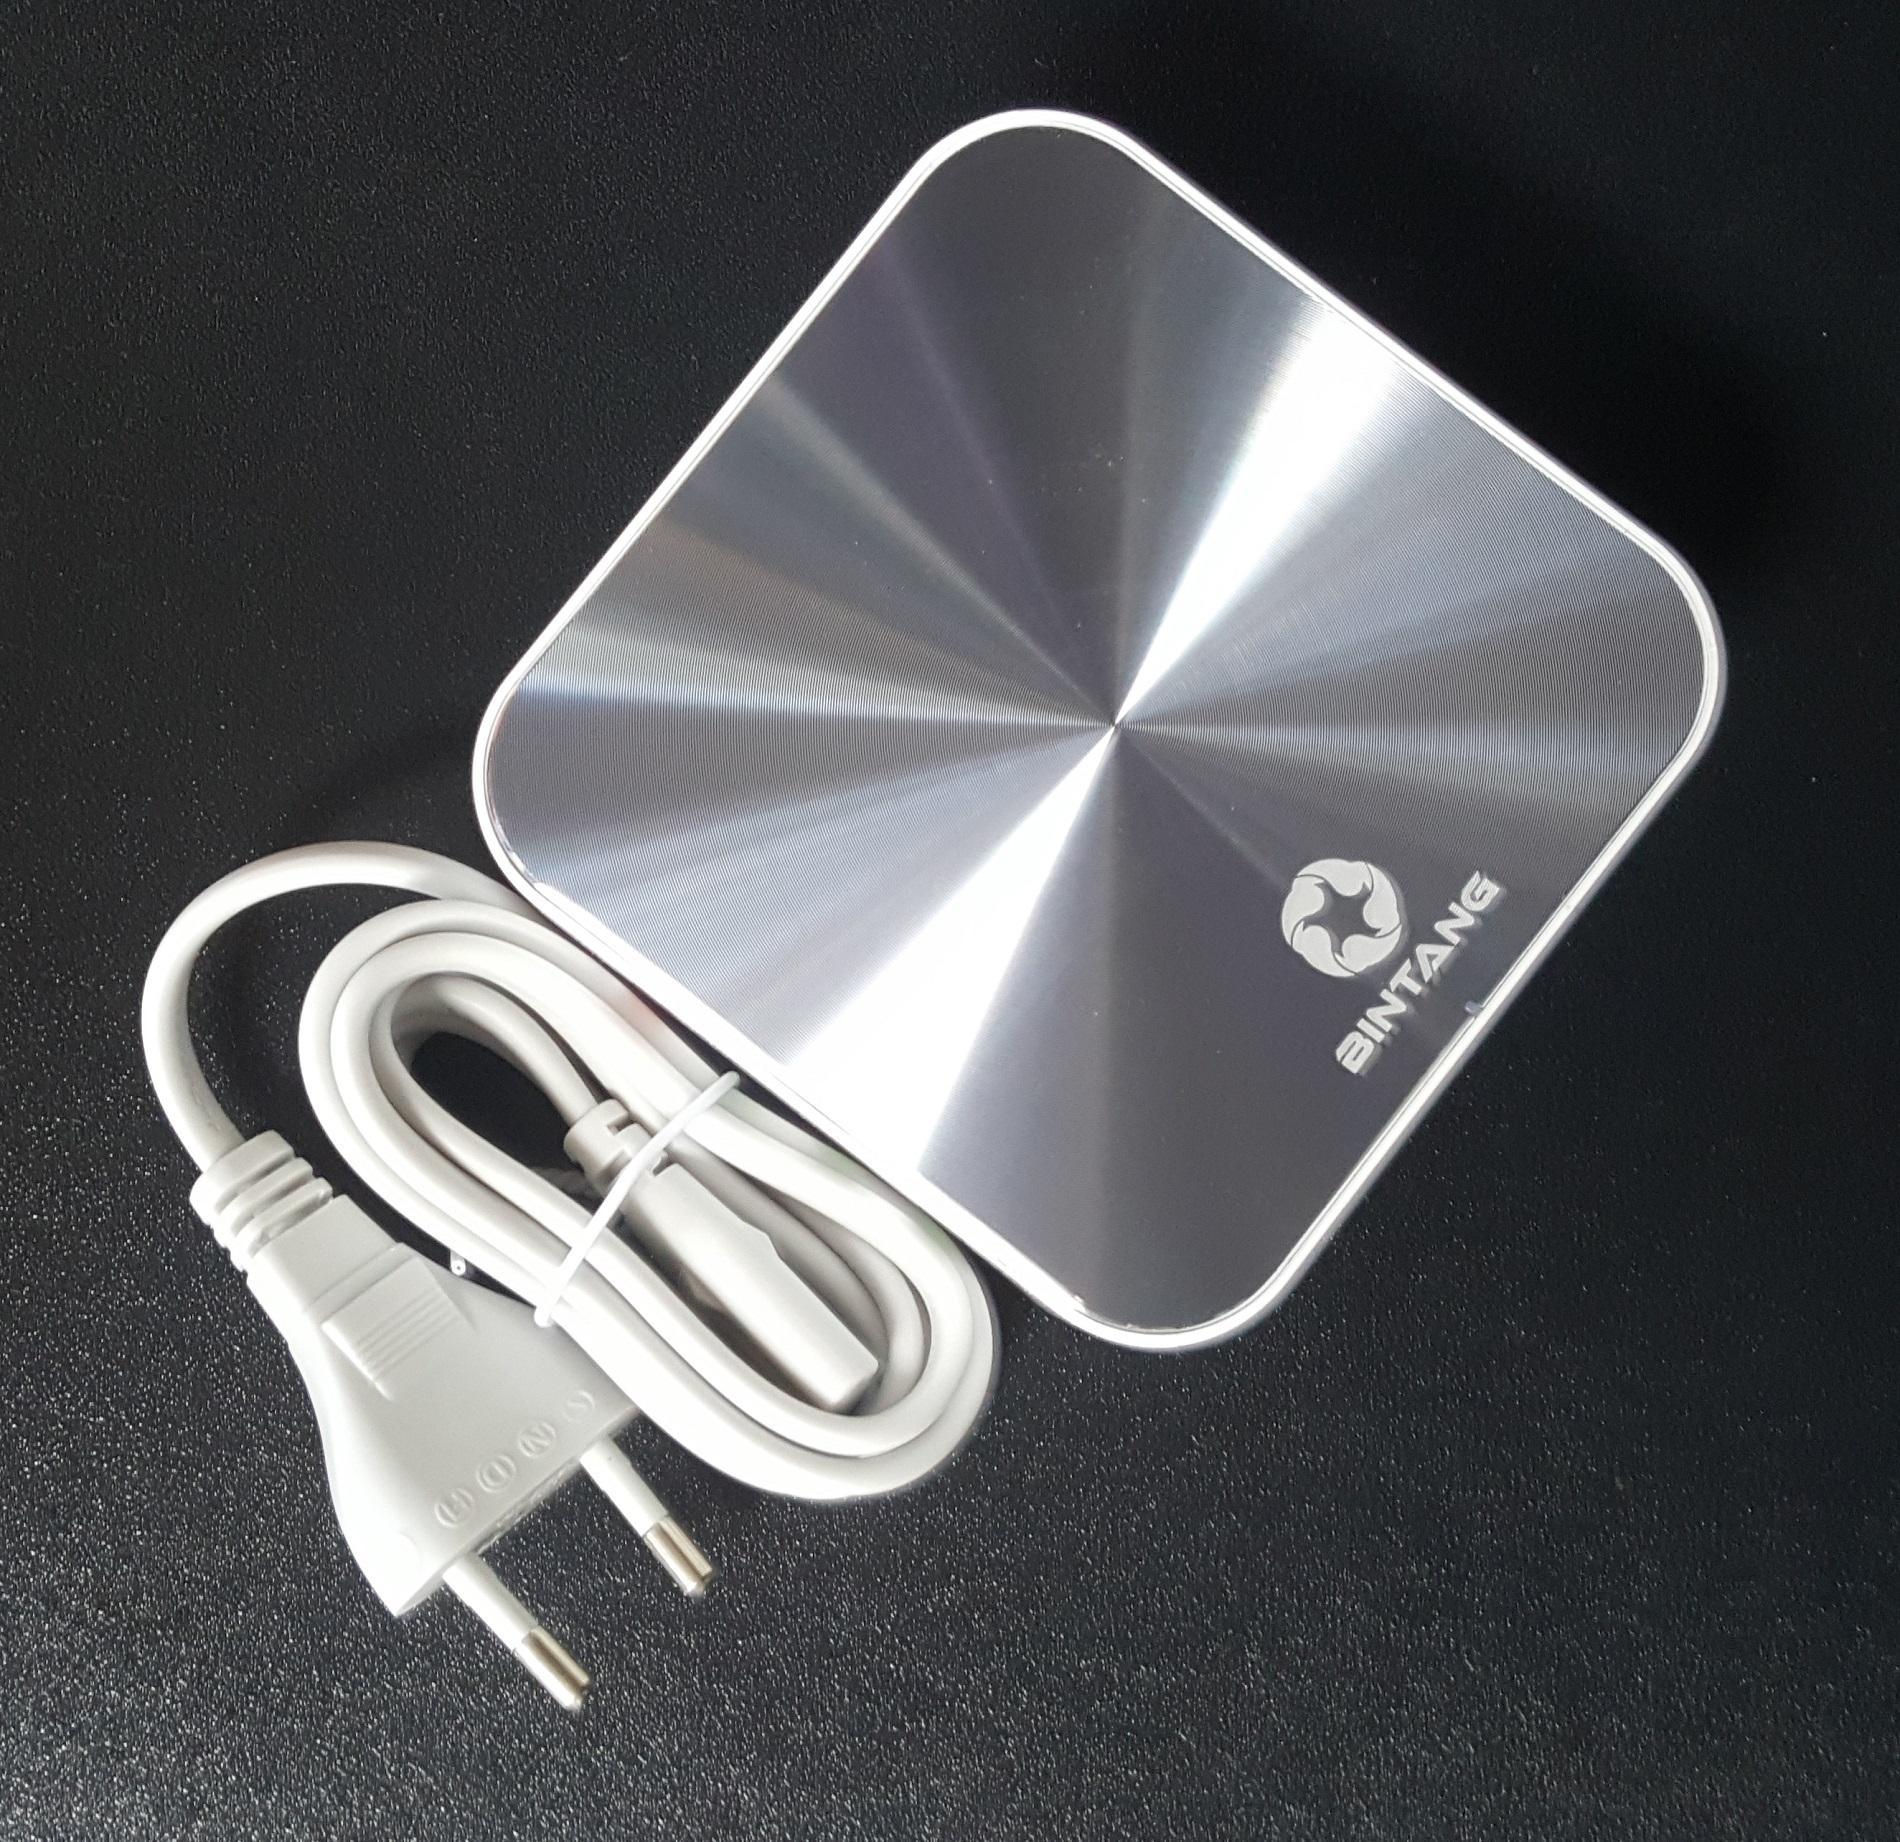 Fitur Quick Charger 3 0 Qualcomm 8 Usb Port For Xiaomi Redmi Samsung Cas Hp Samung Detail Gambar 30 Zenfone Handphone Fast Charging Bintang Terbaru